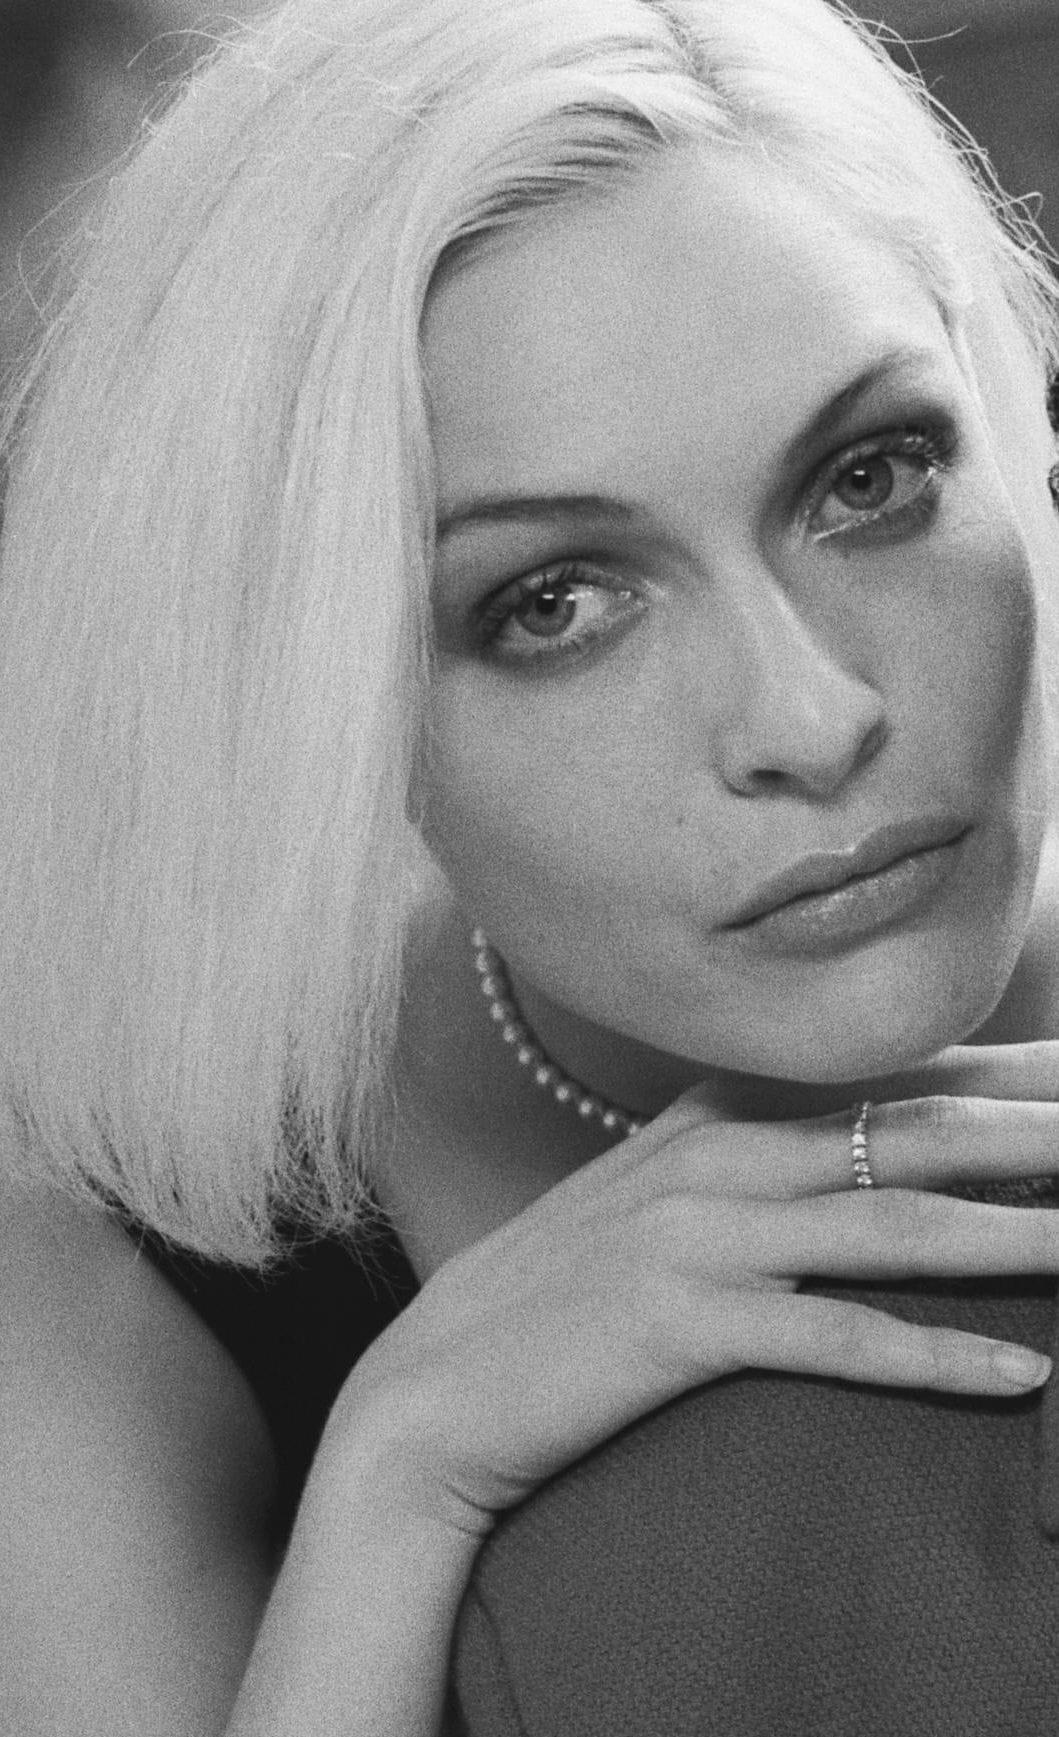 http://www.linternaute.com/cinema/star-cinema/heroines-de-luc-besson/image/angela1a-cinema-stars-2221349.jpg